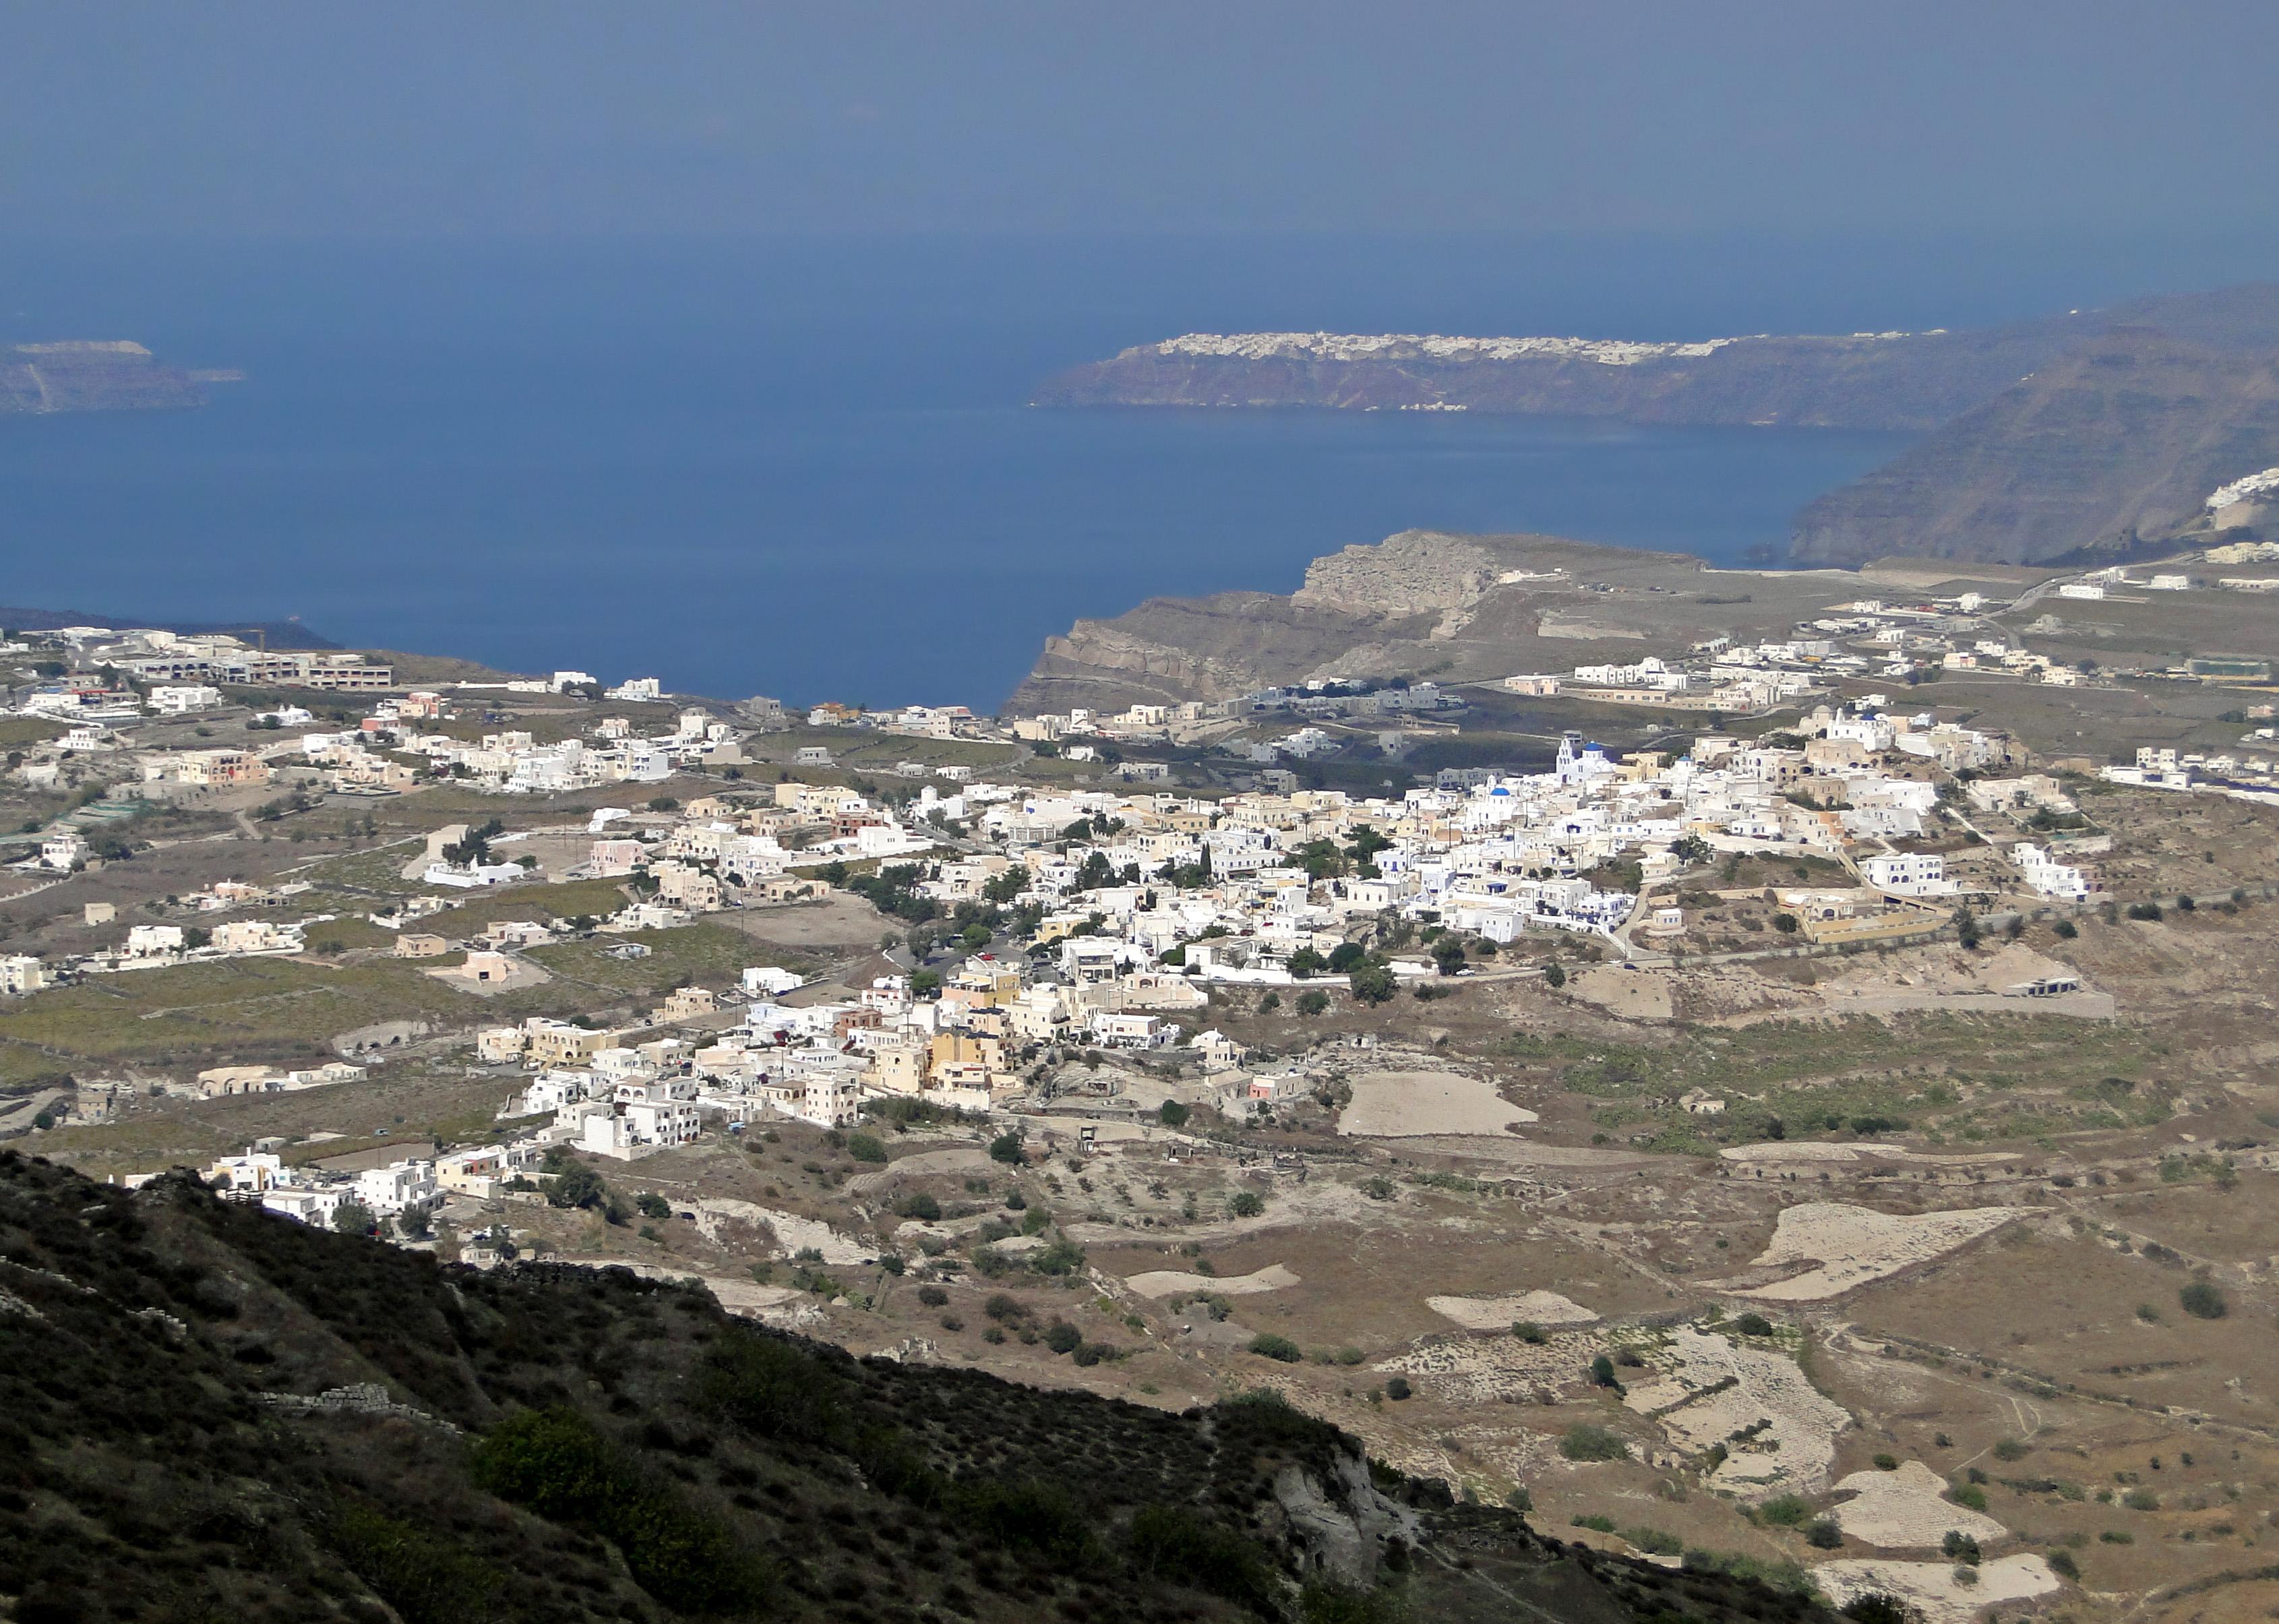 File:Village of Pyrgos.jpg - Wikimedia Commons